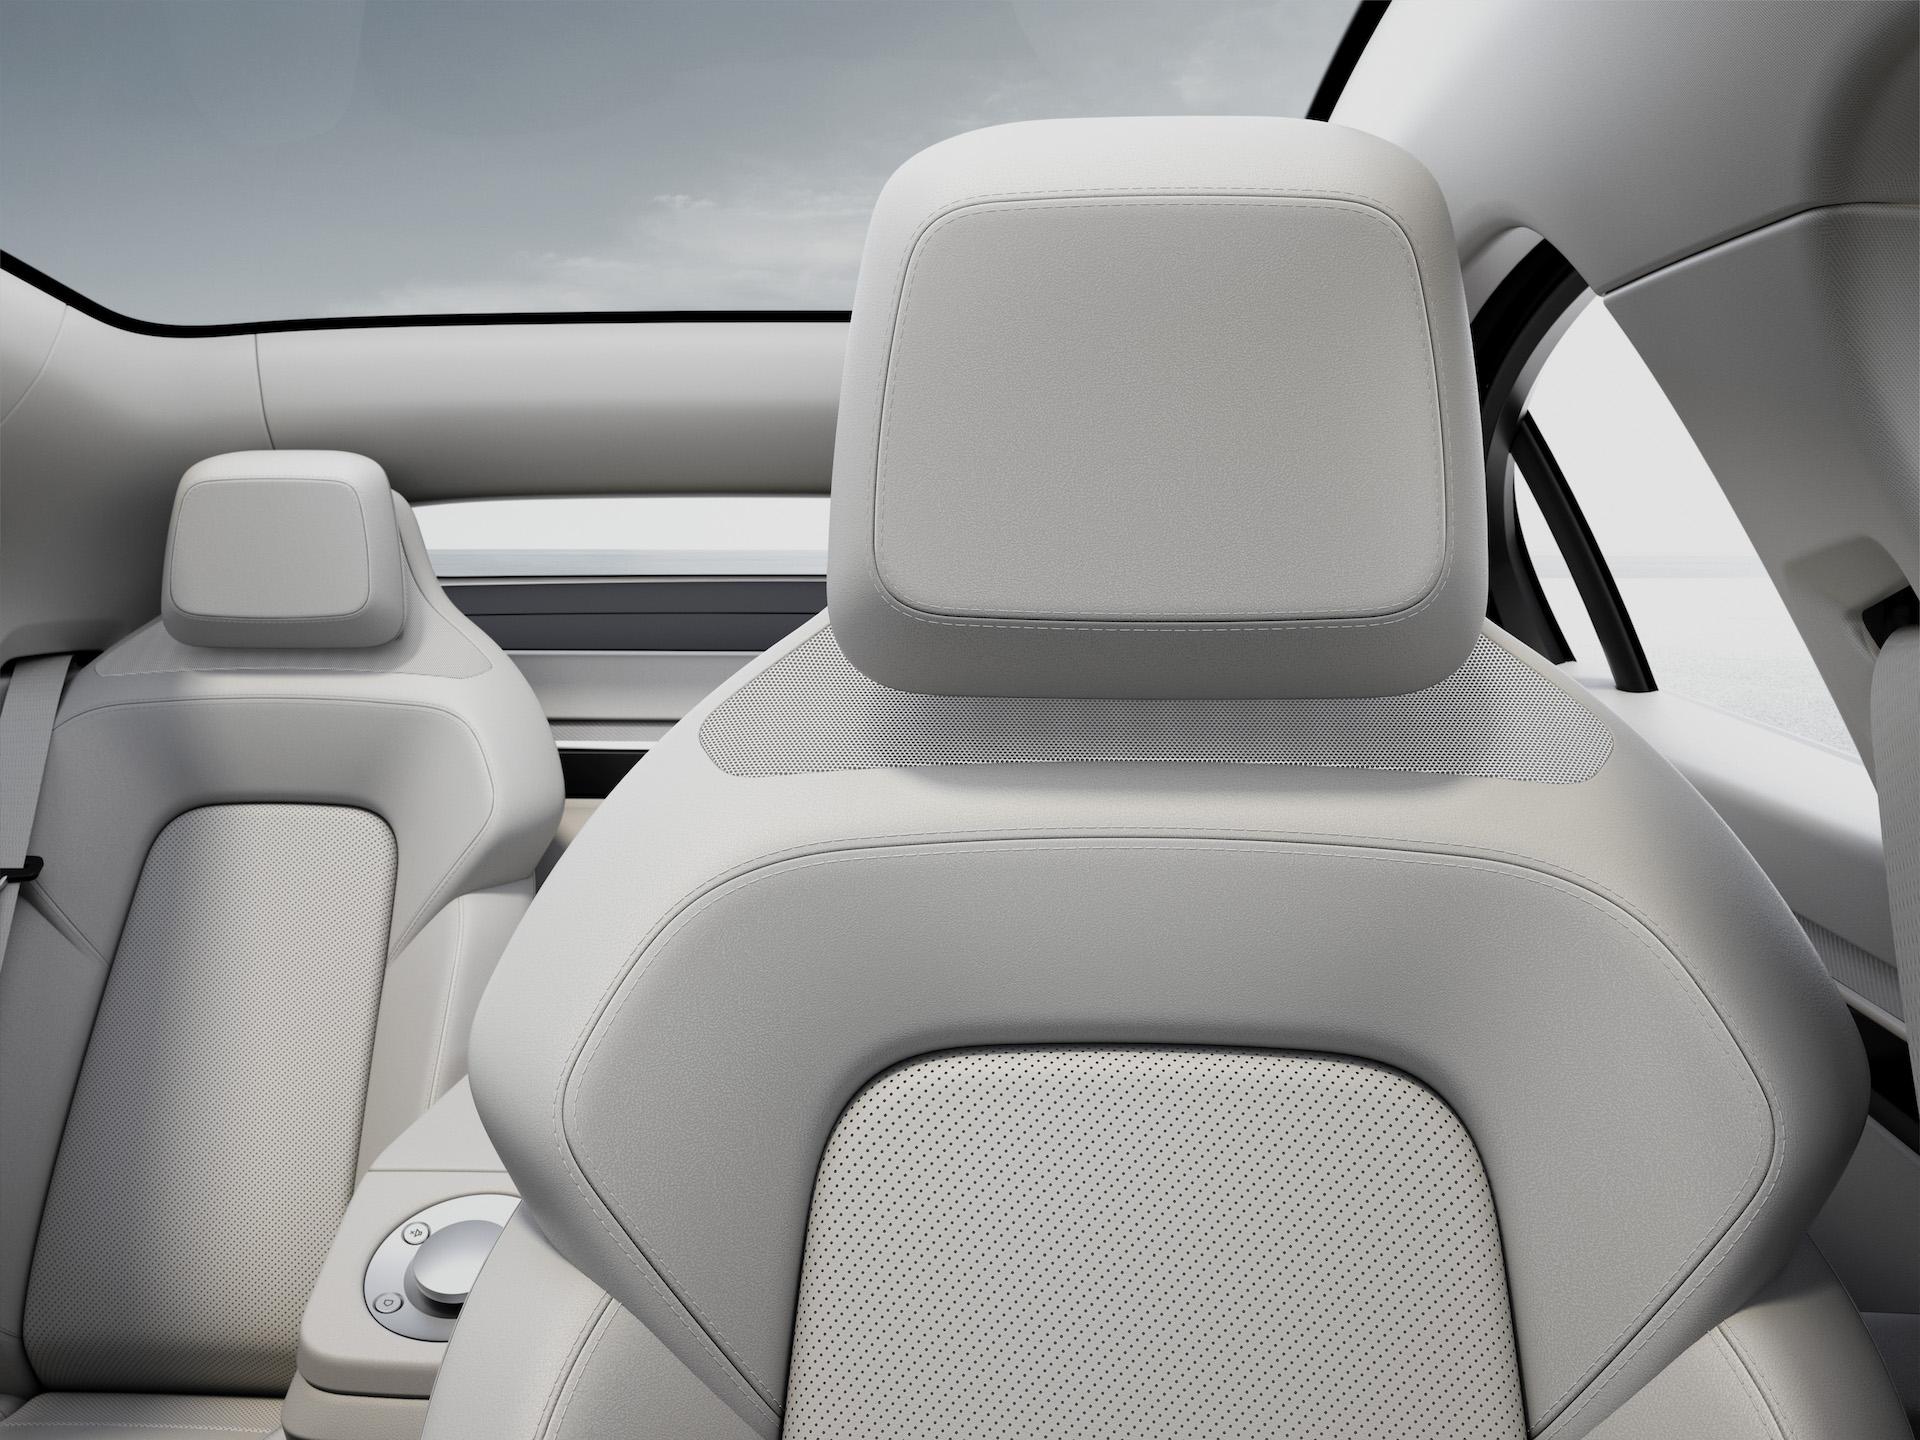 Vision S: Sony präsentiert den Prototypen eines eigenen Elektroautos 8